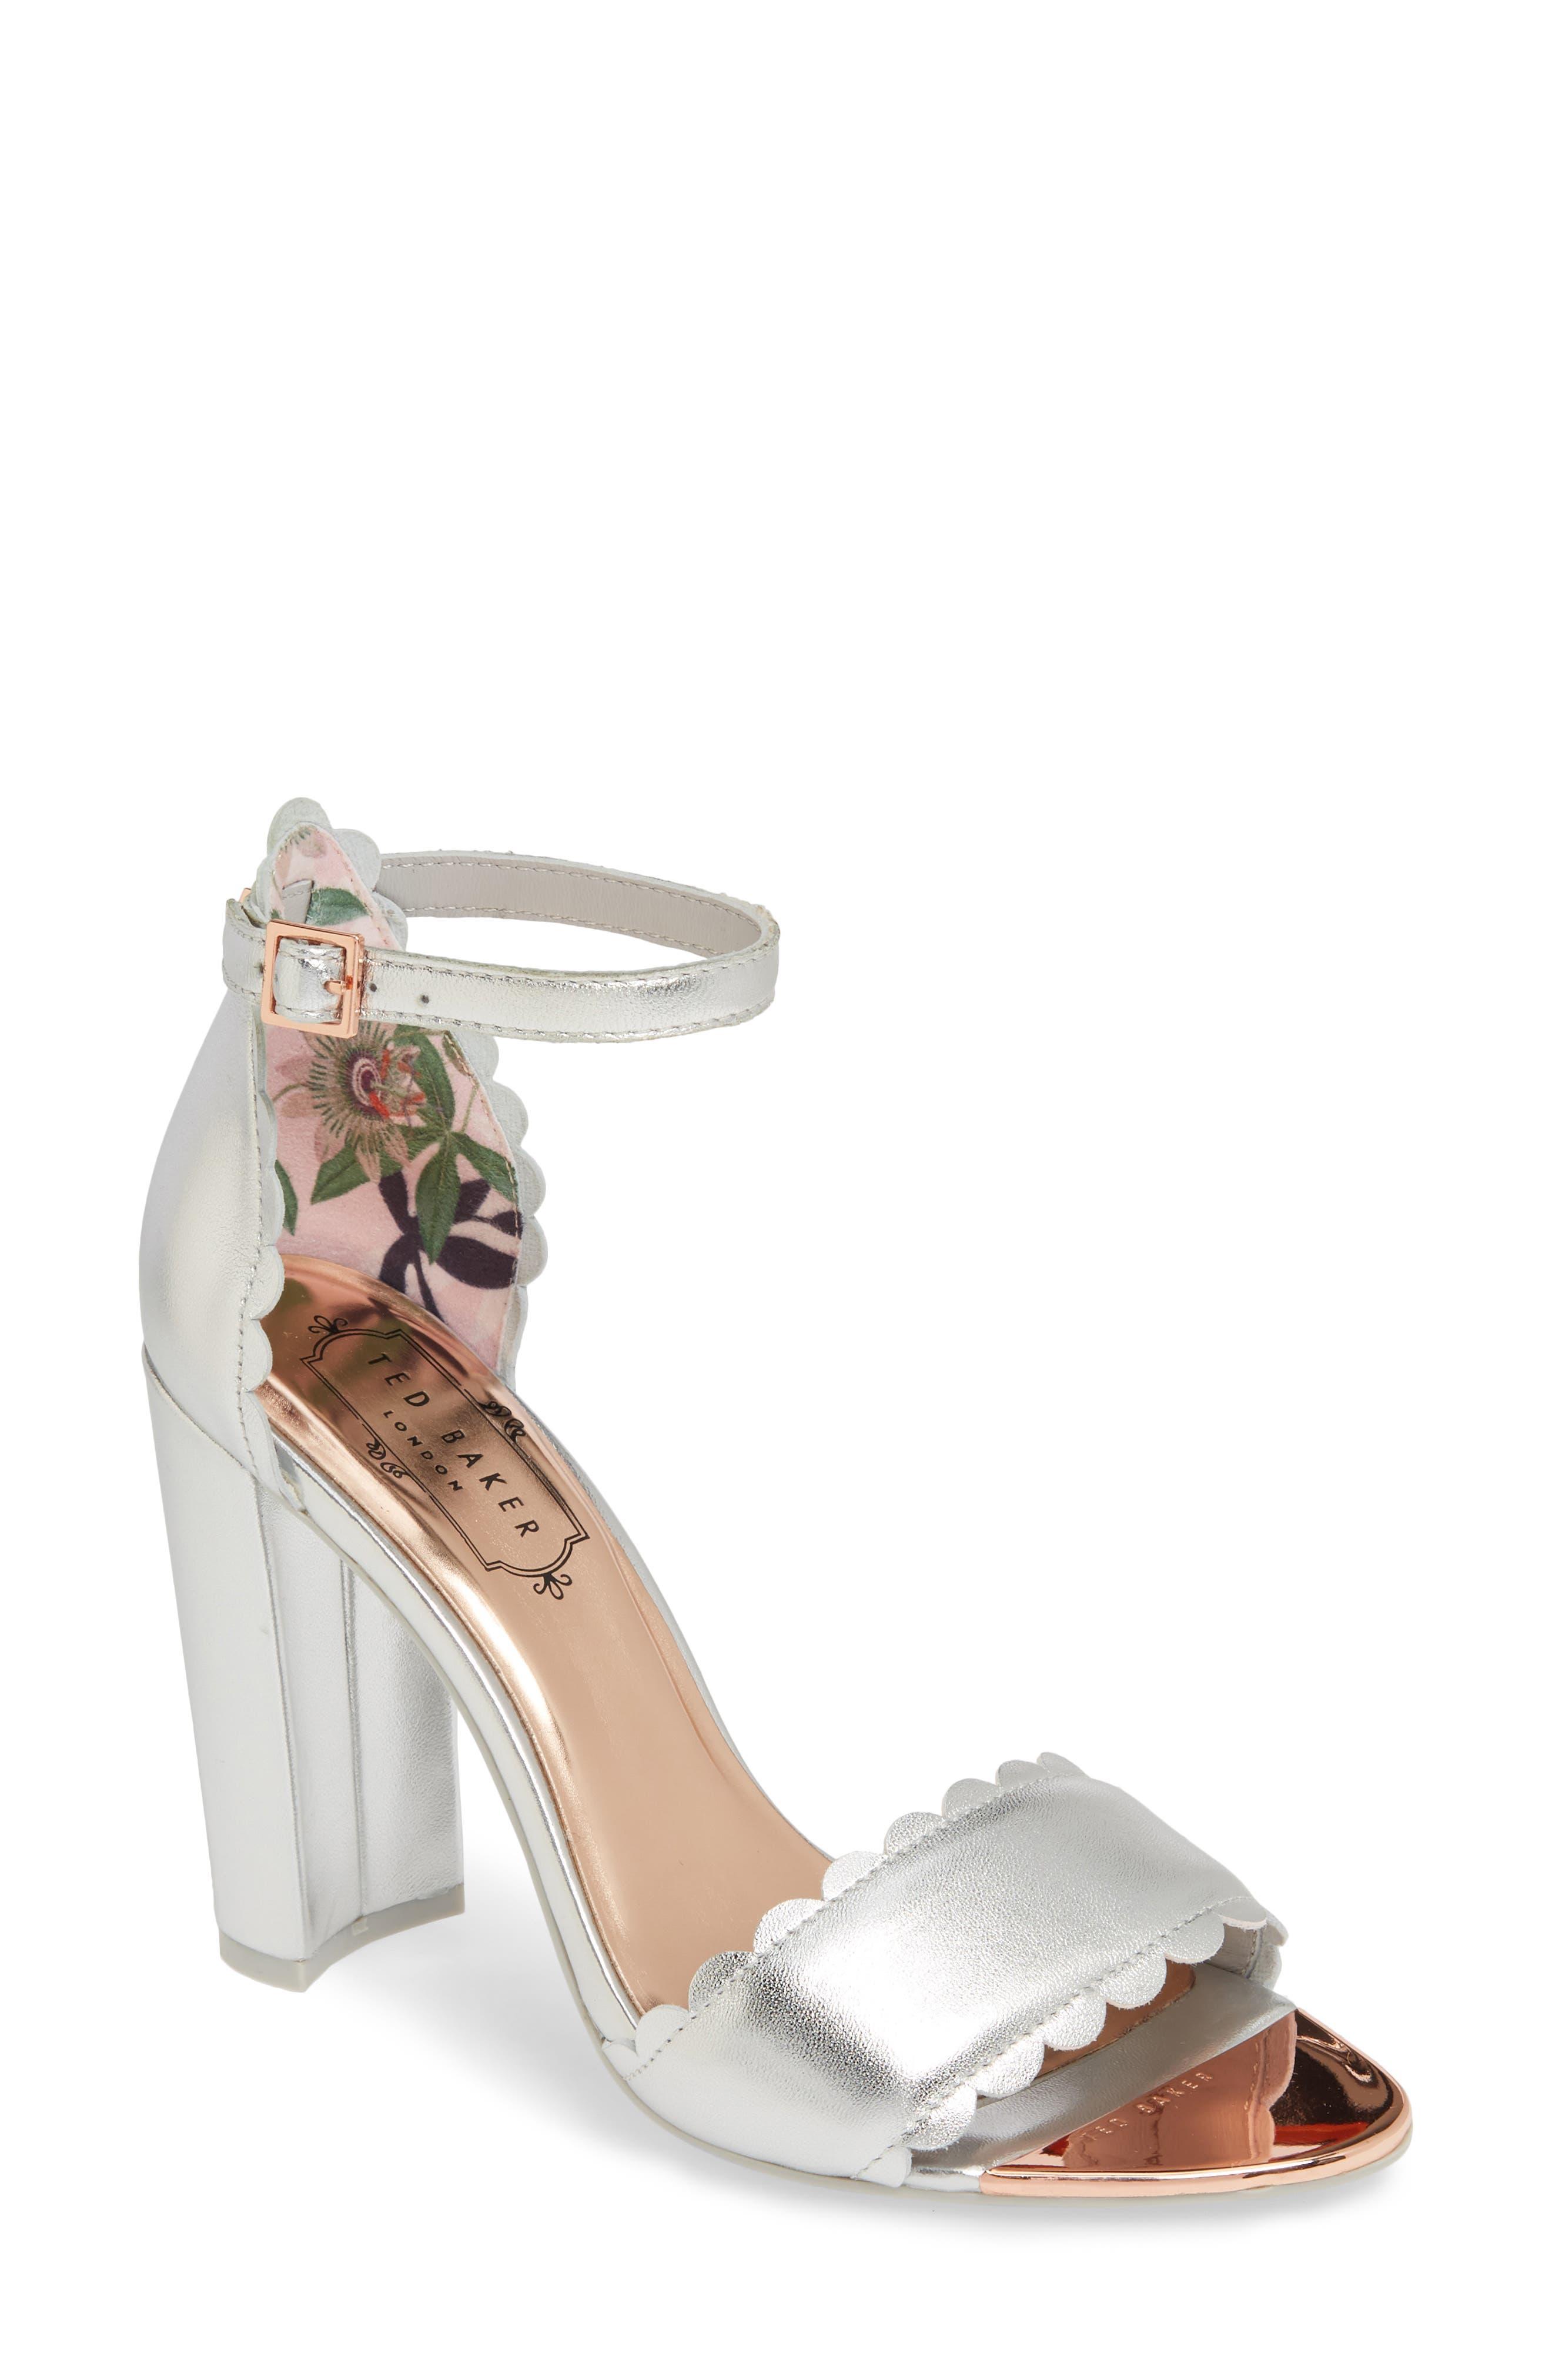 Ted Baker London Raidhal Sandal - Metallic